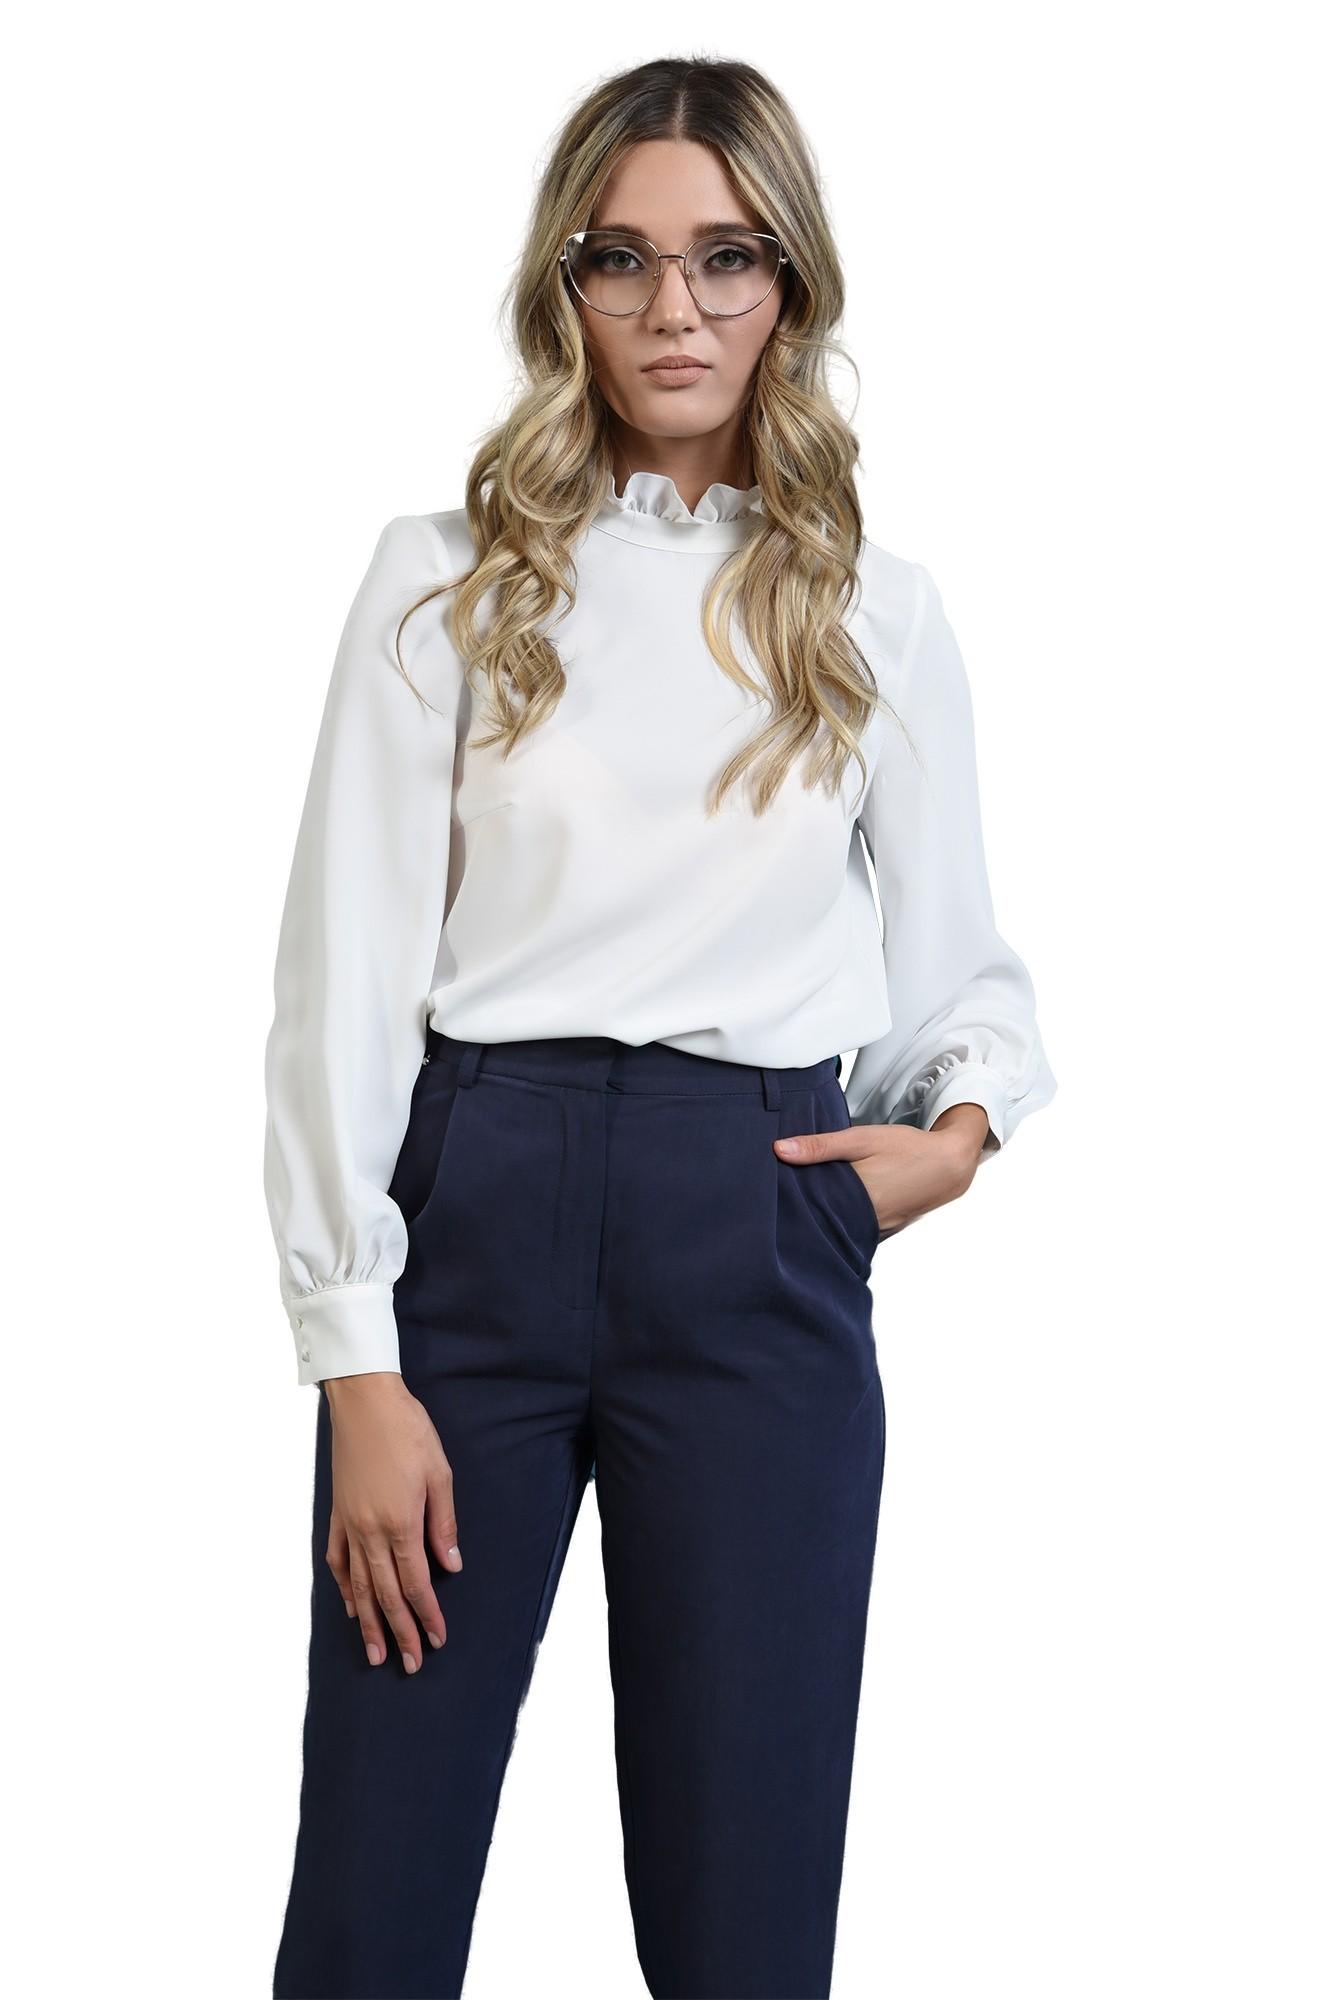 pantaloni cu buzunare laterale, tigareta